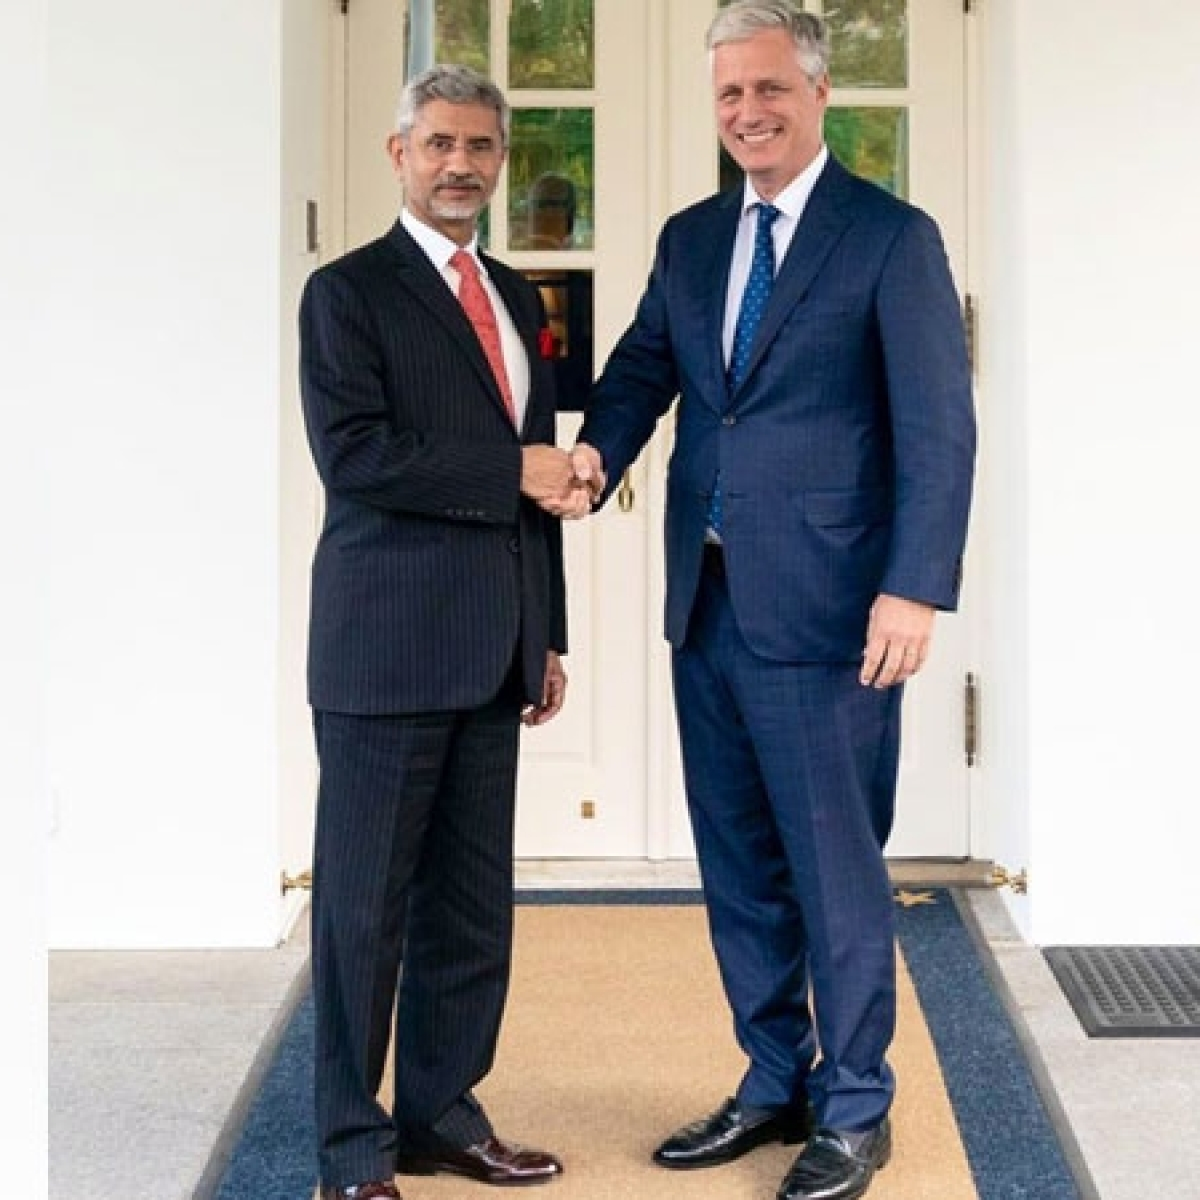 EAM S Jaishankar meets US National Security Advisor Robert O'Brien